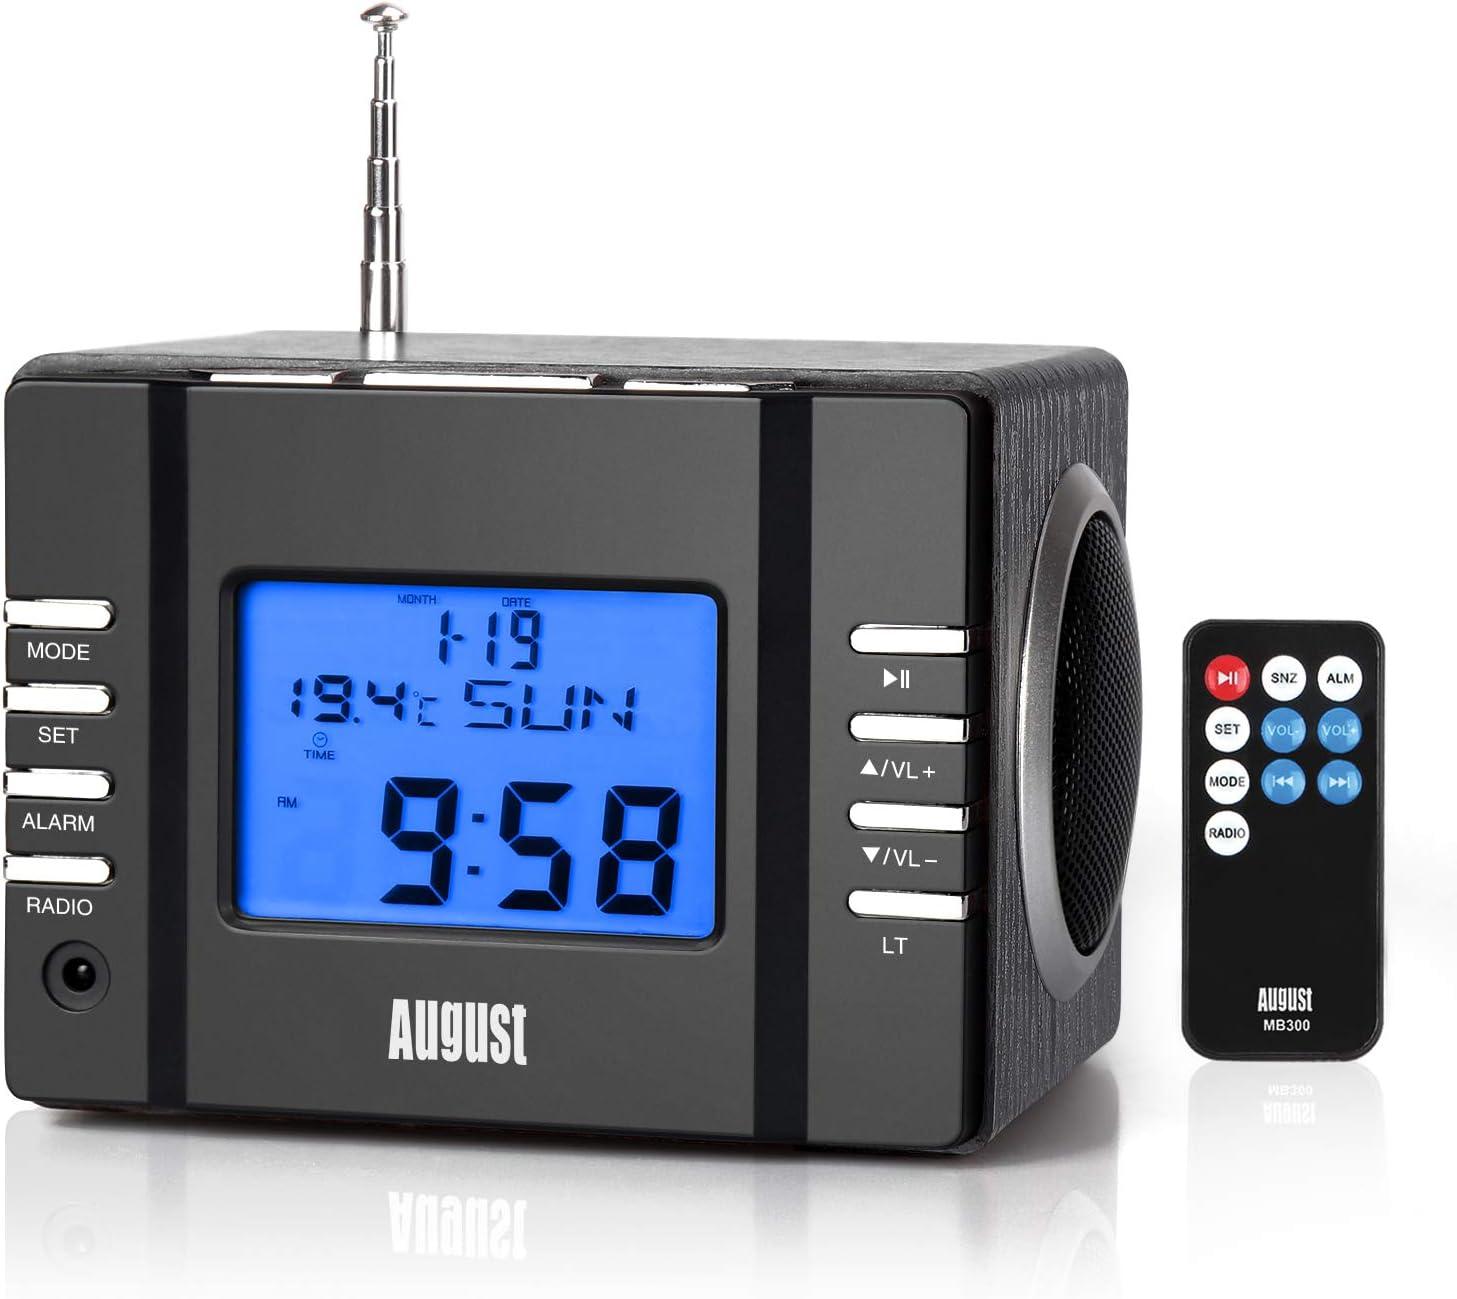 Radio Reloj Despertador - August MB300 - Radio FM con Altavoz Lector MP3 / Tarjeta SD/Termómetro Radiodespertadores Sistema Estéreo Sleep Timer / 3.5mm Jack/Telecomando